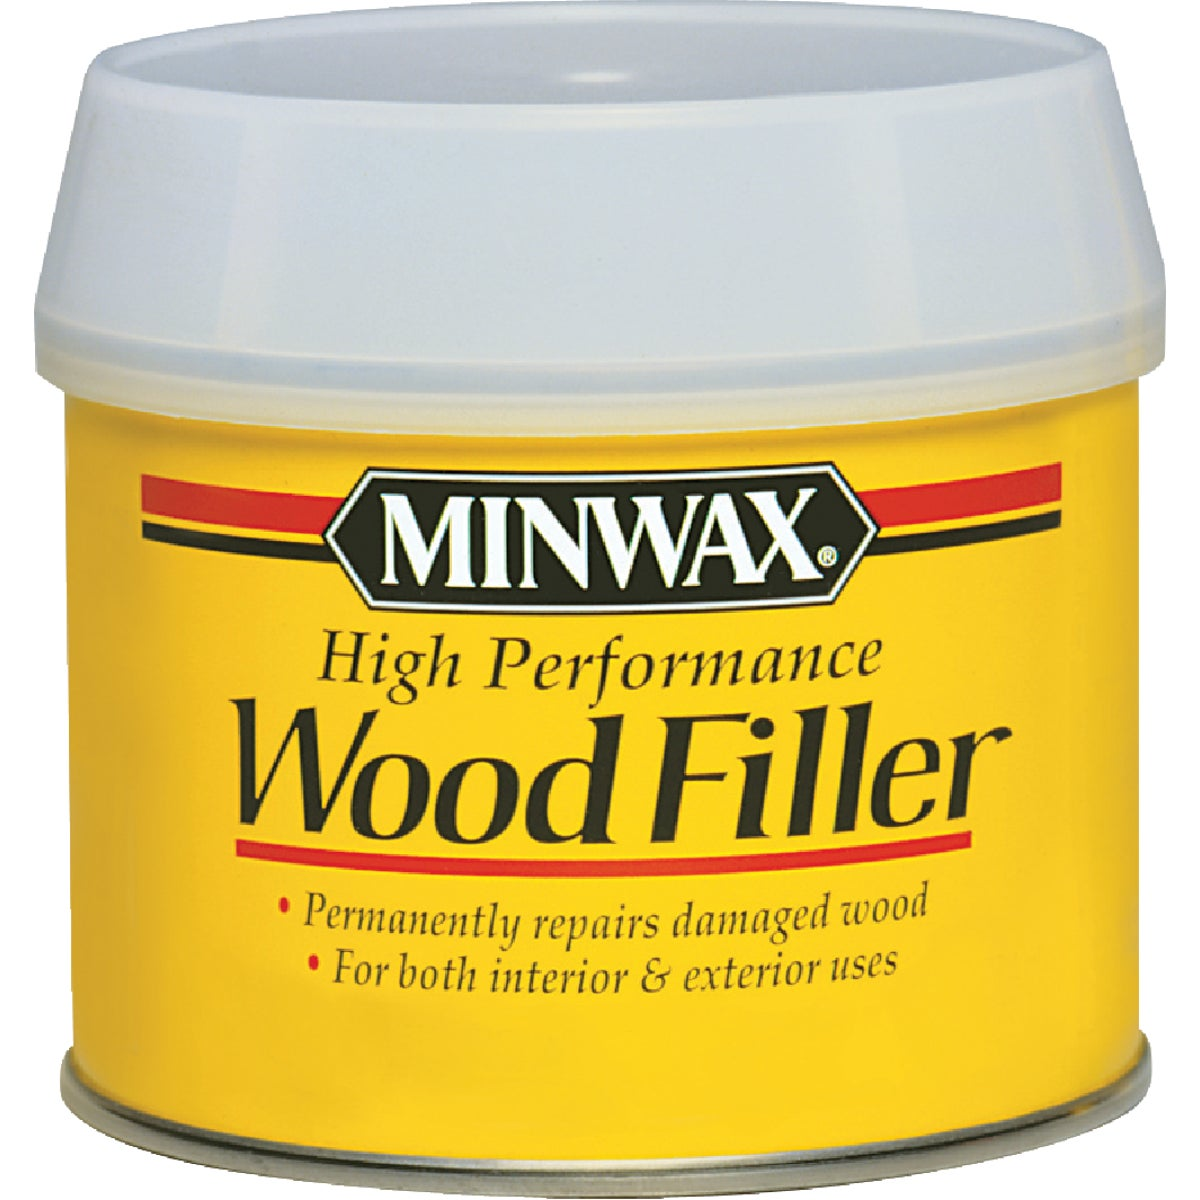 6OZ WOOD FILLER - 41600 by Minwax Company